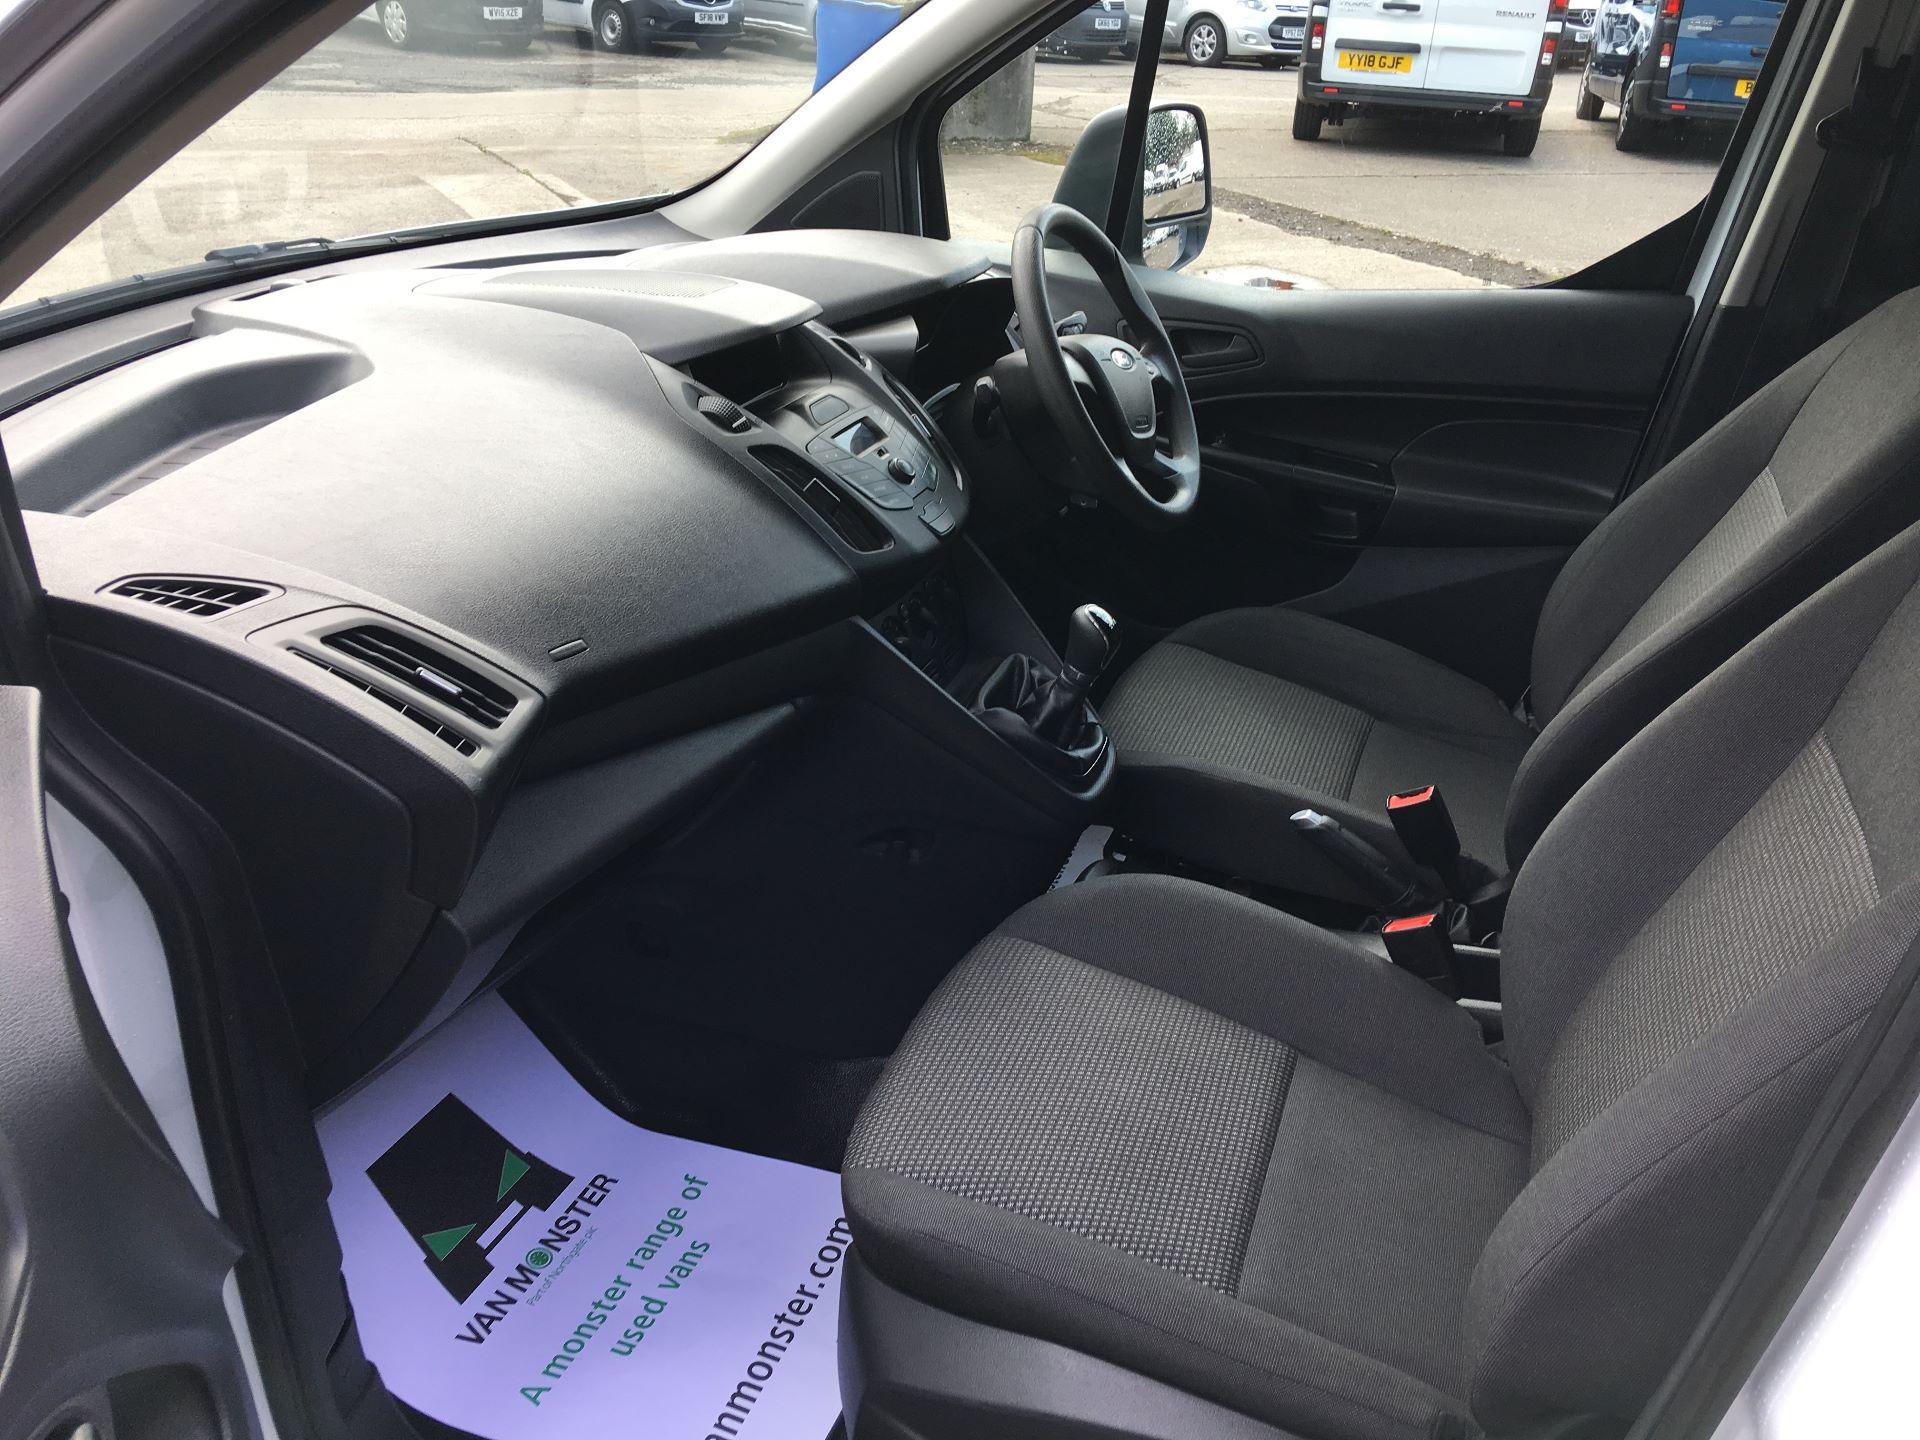 2017 Ford Transit Connect 200 L1 DIESEL 1.5 TDCI 75PS VAN EURO 5 (BW17YBX) Image 13